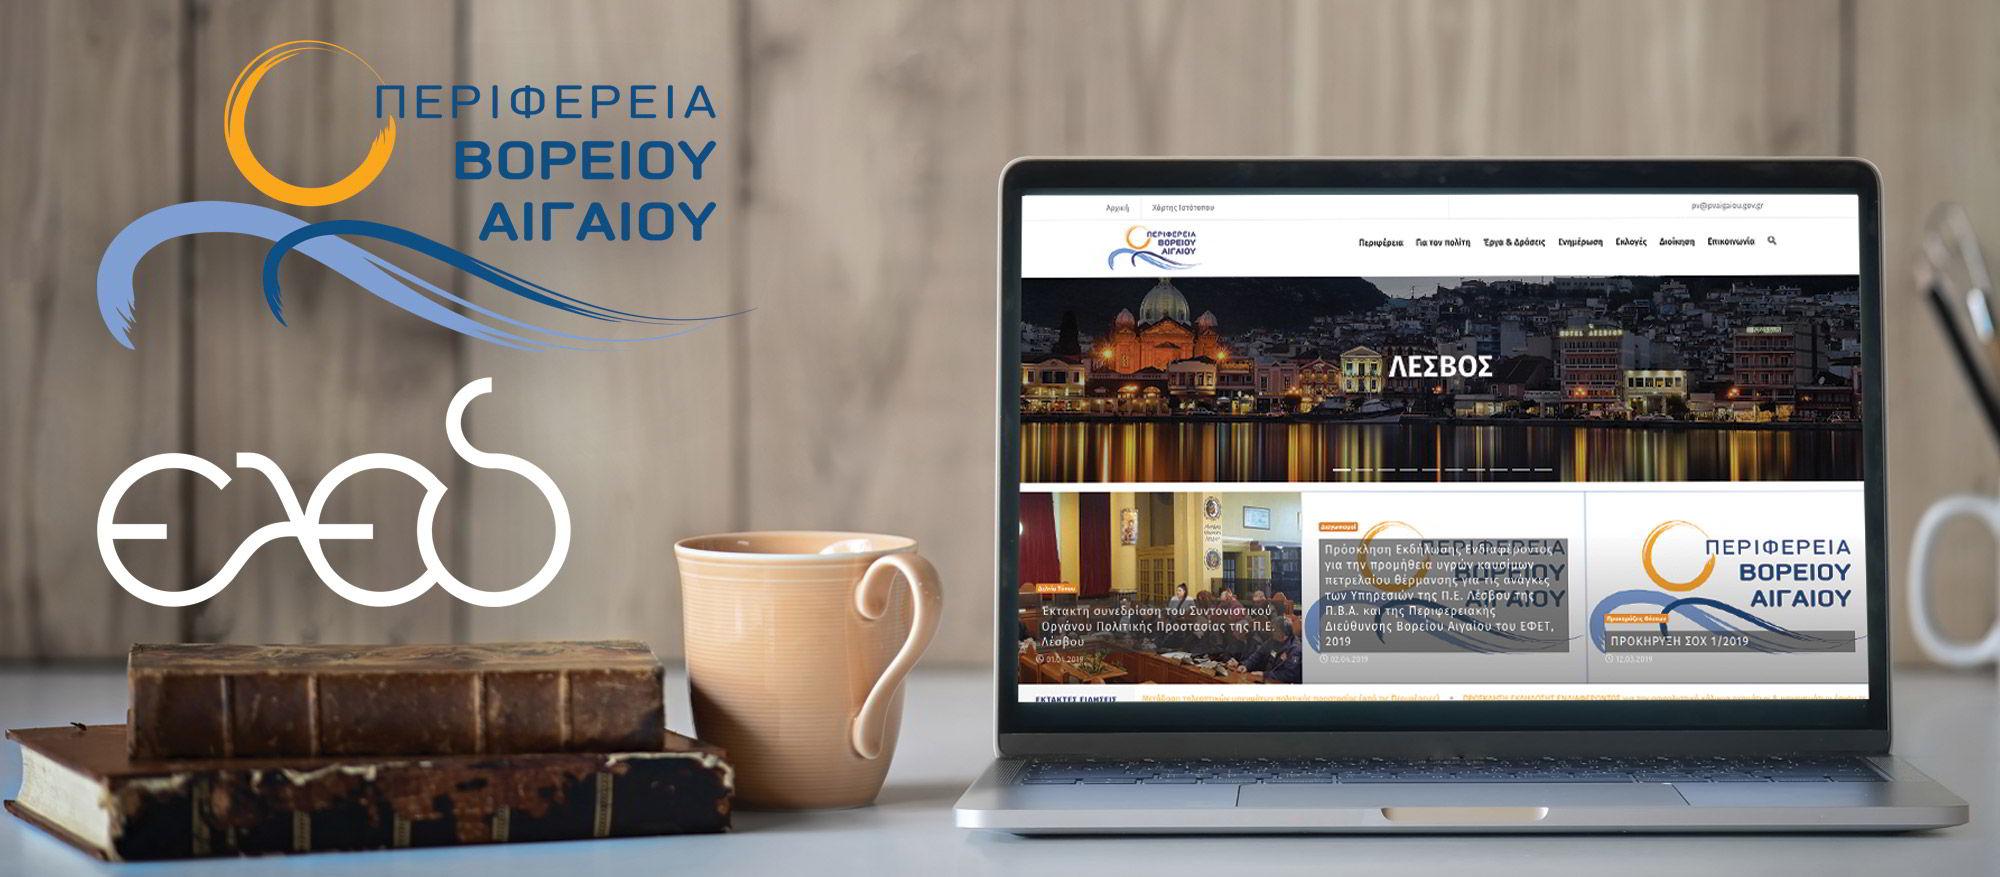 9bb4e356be Ελληνική Εταιρεία Διαδικτύου - ΕΛΕΔ